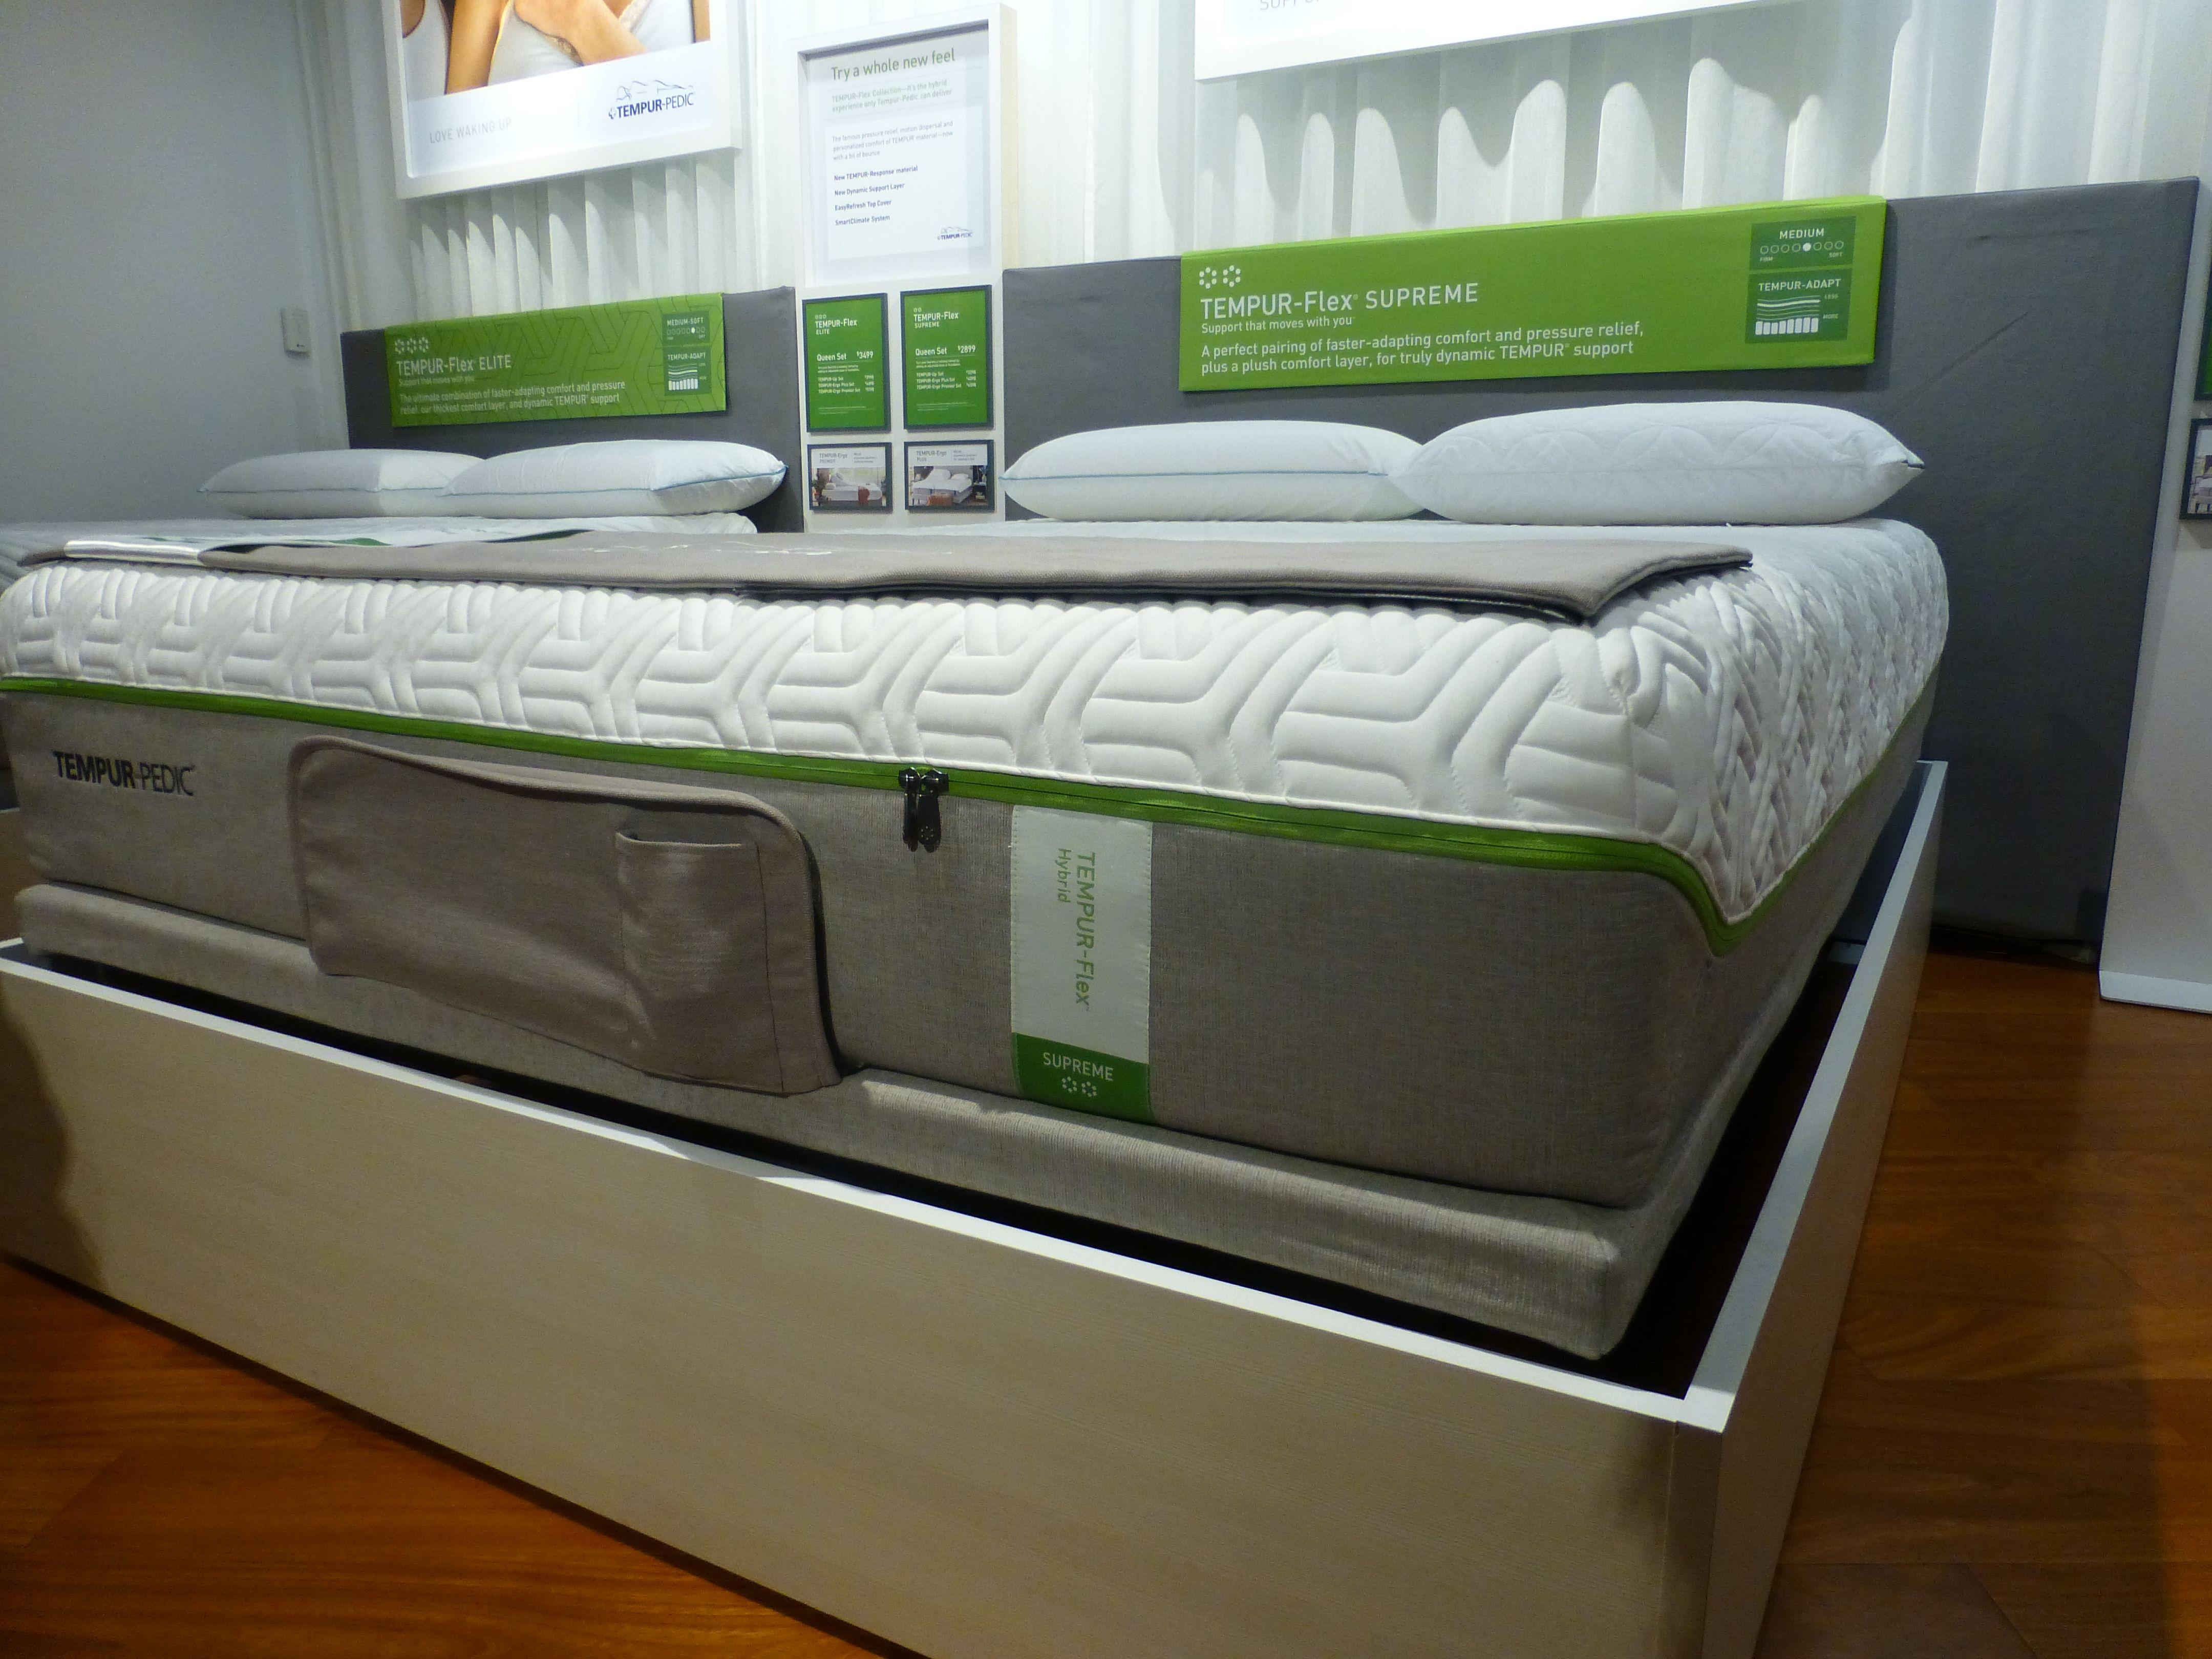 mattress at tempurpedic - Tempur Pedic Beds